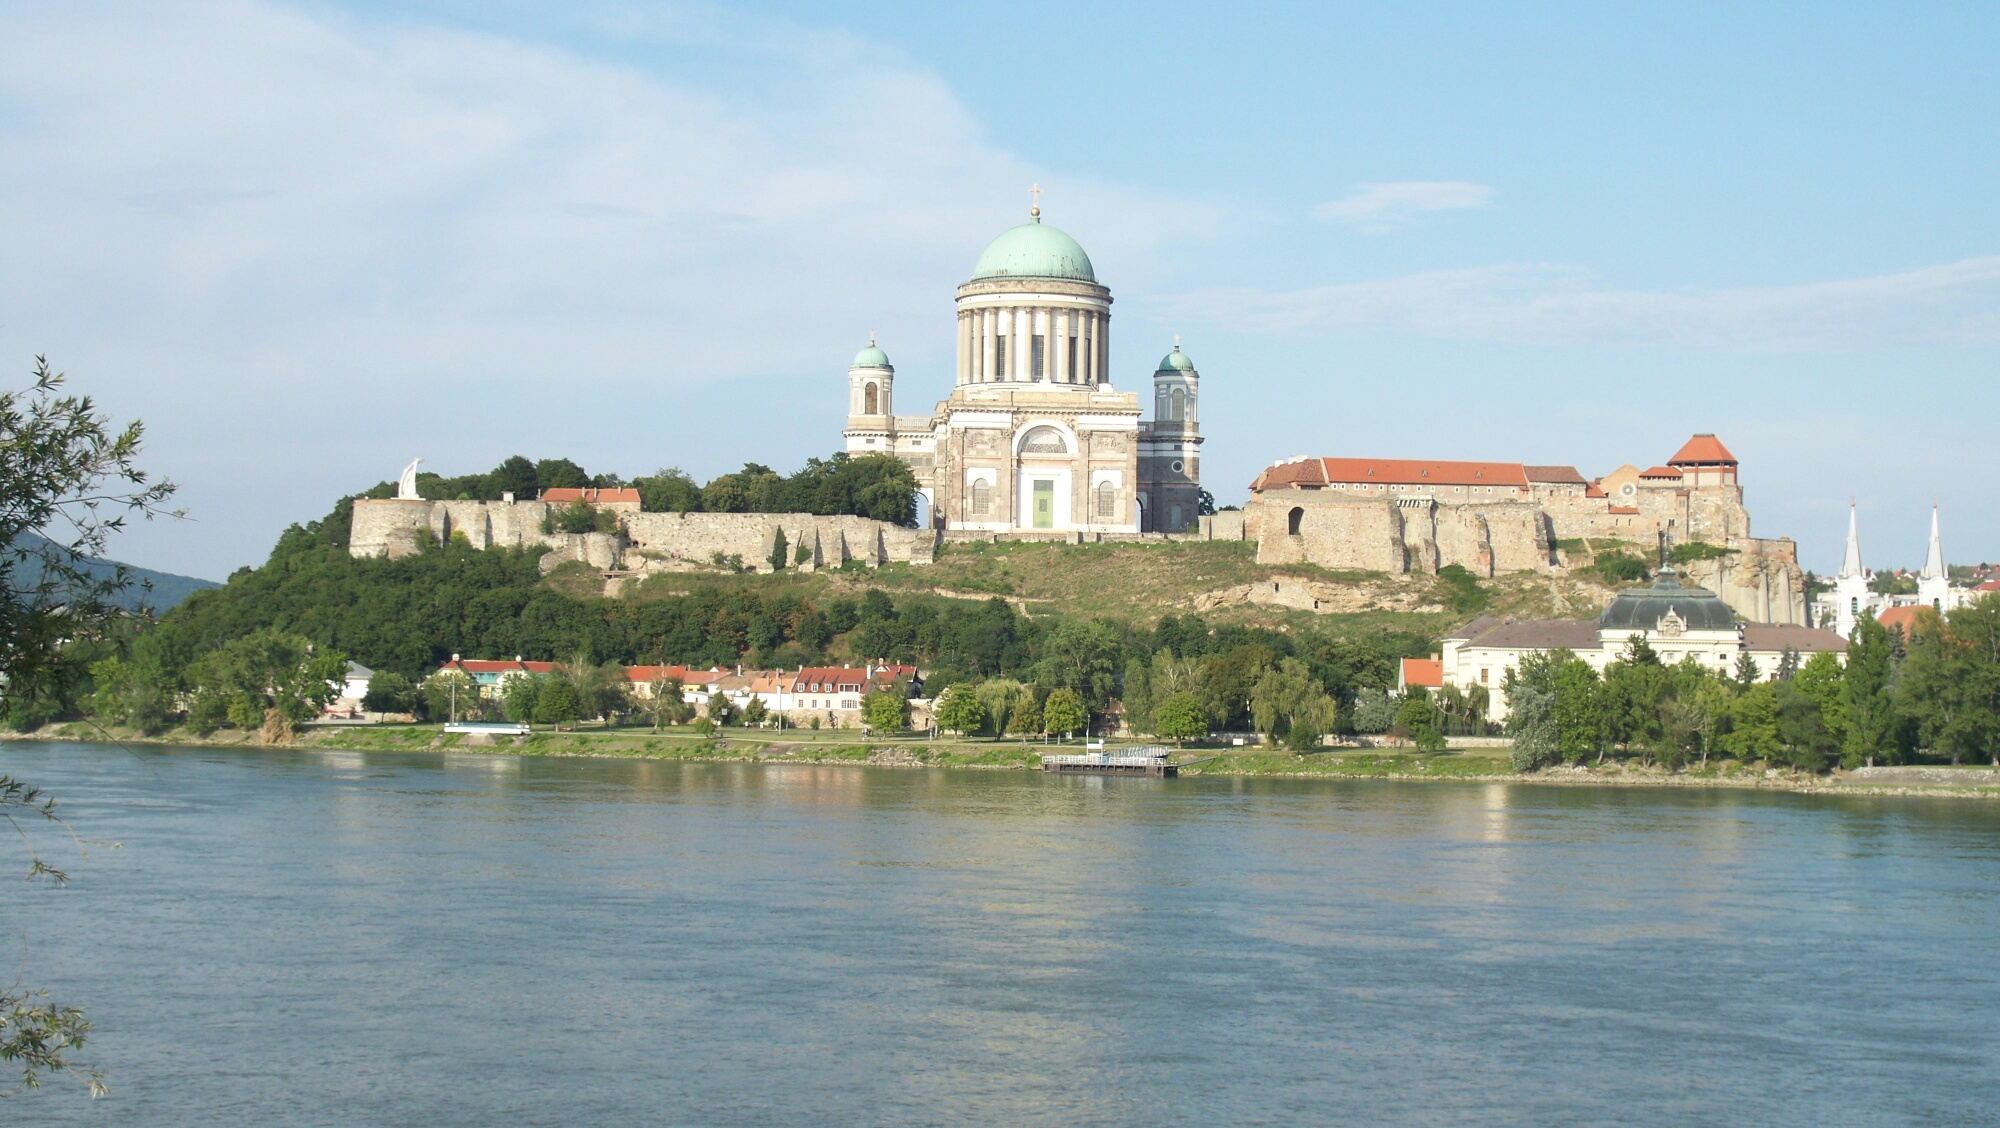 Sankt-Adalbert-Kathedrale (Esztergom)